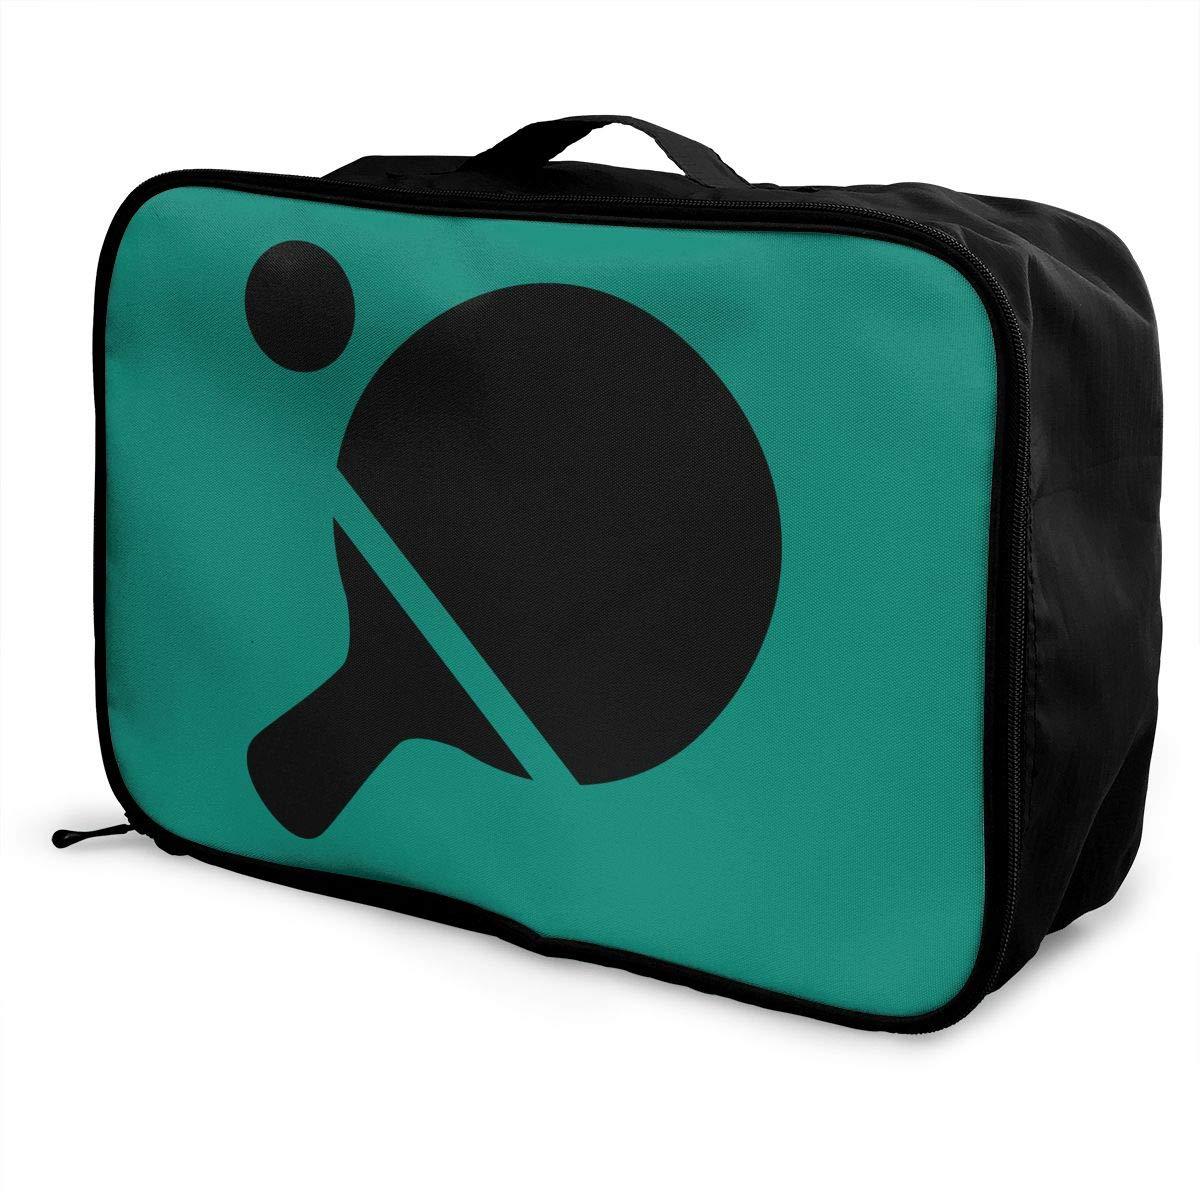 FAJRO Duffle Bag for Women Men Wavy Line Travel Duffel Bag Large Size Water-proof Tear Resistant